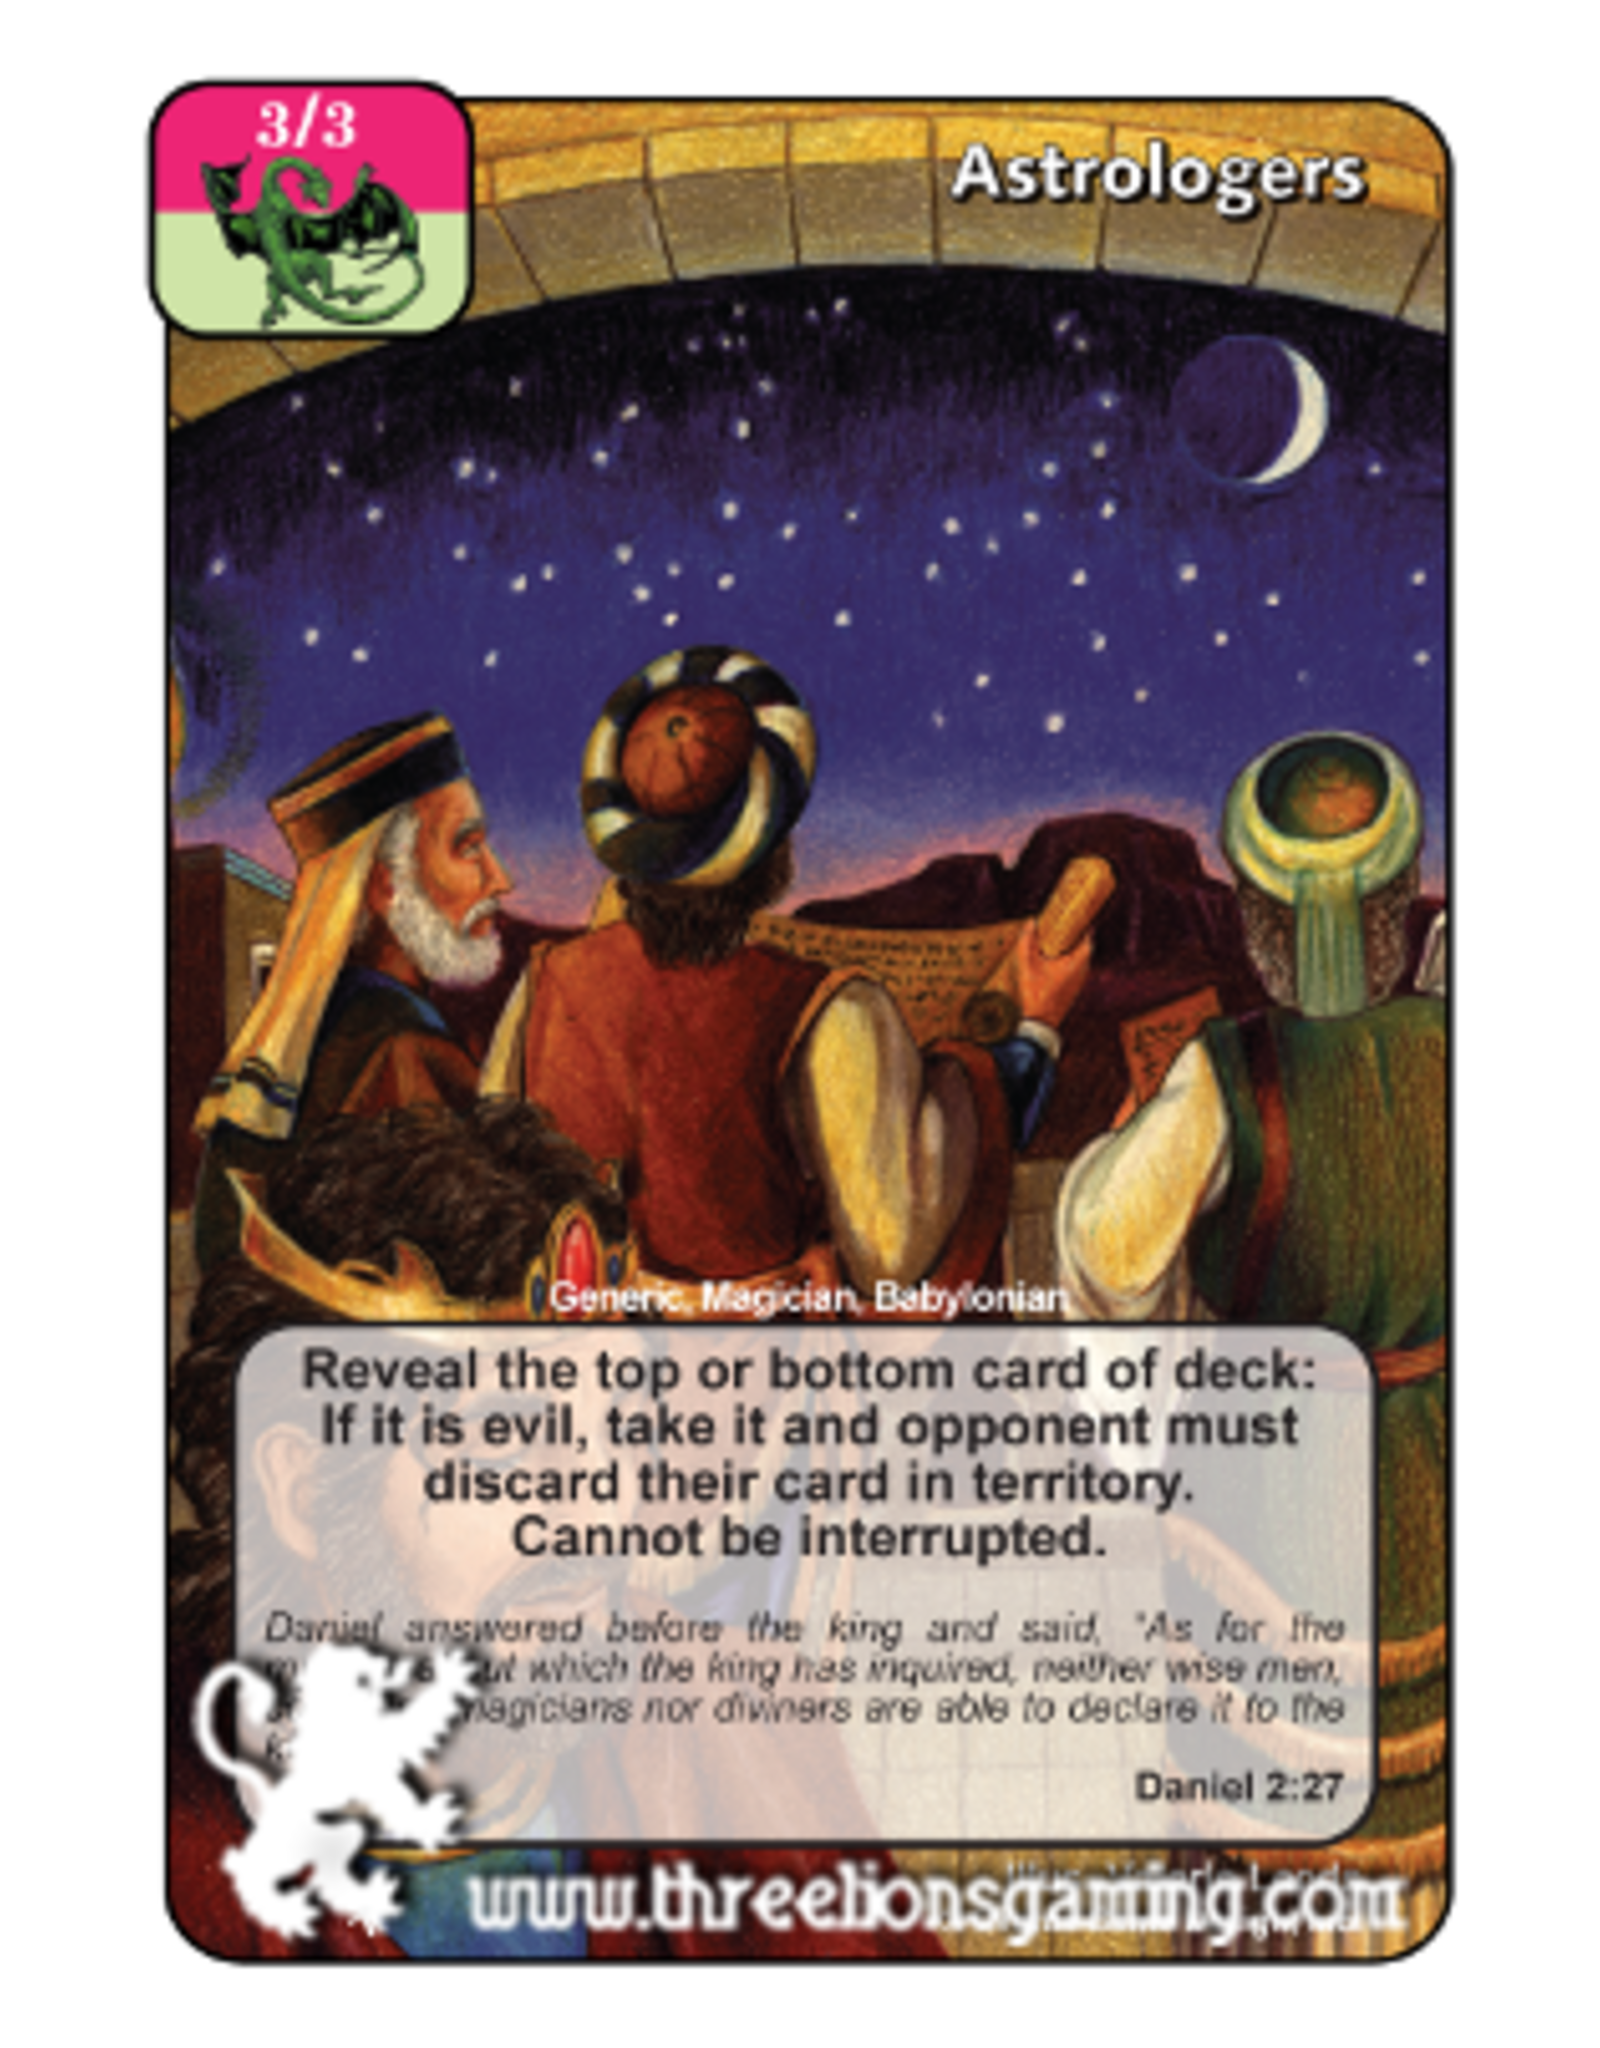 PoC: Astrologers